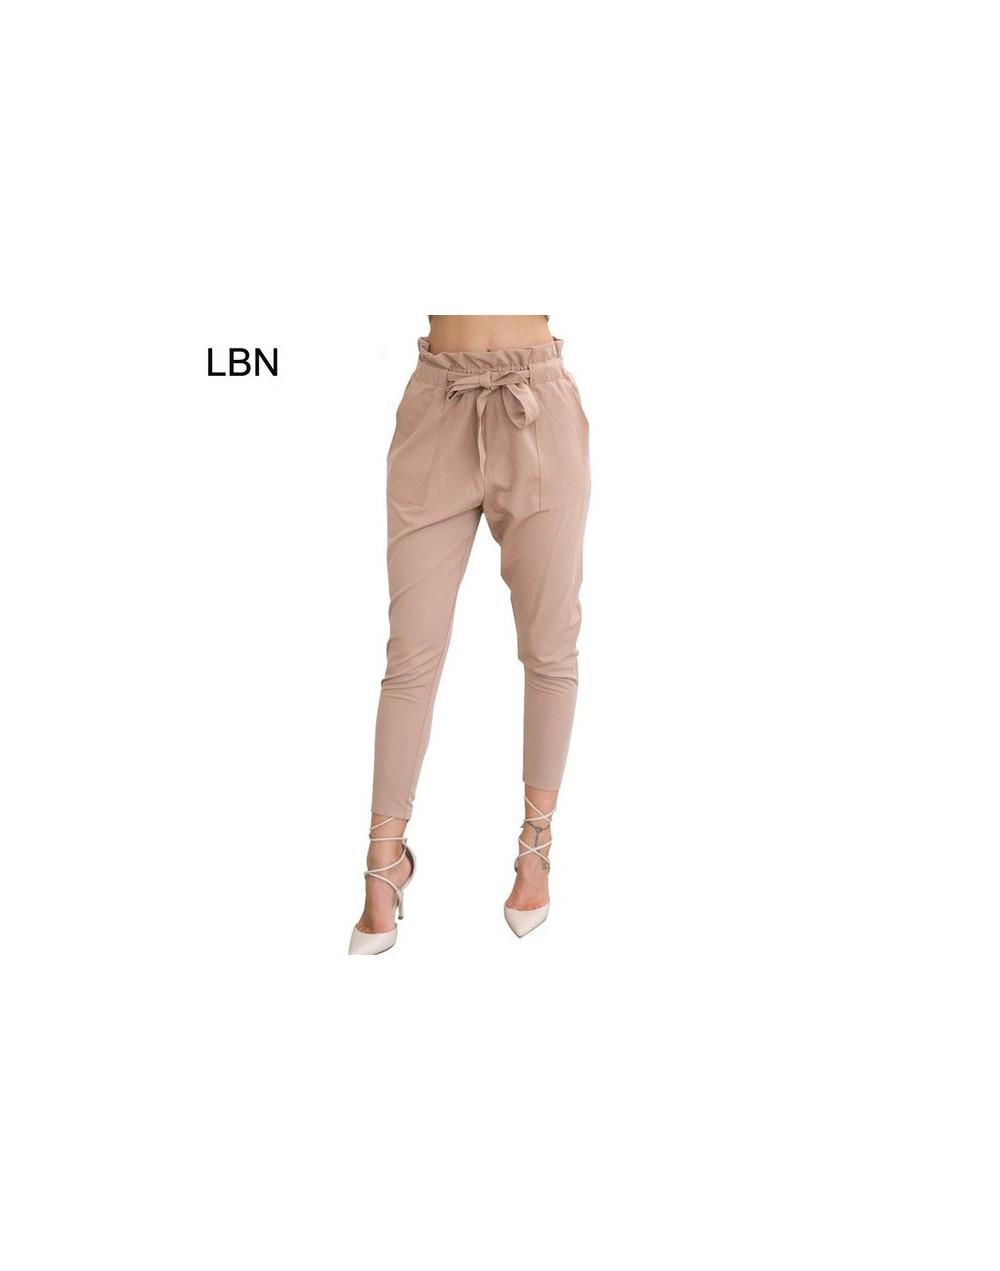 2019 New Brand High Elastic Waist Harem Pants Women Spring Summer Fashion Ninth Pants Female Office Lady Black Trousers Belt...